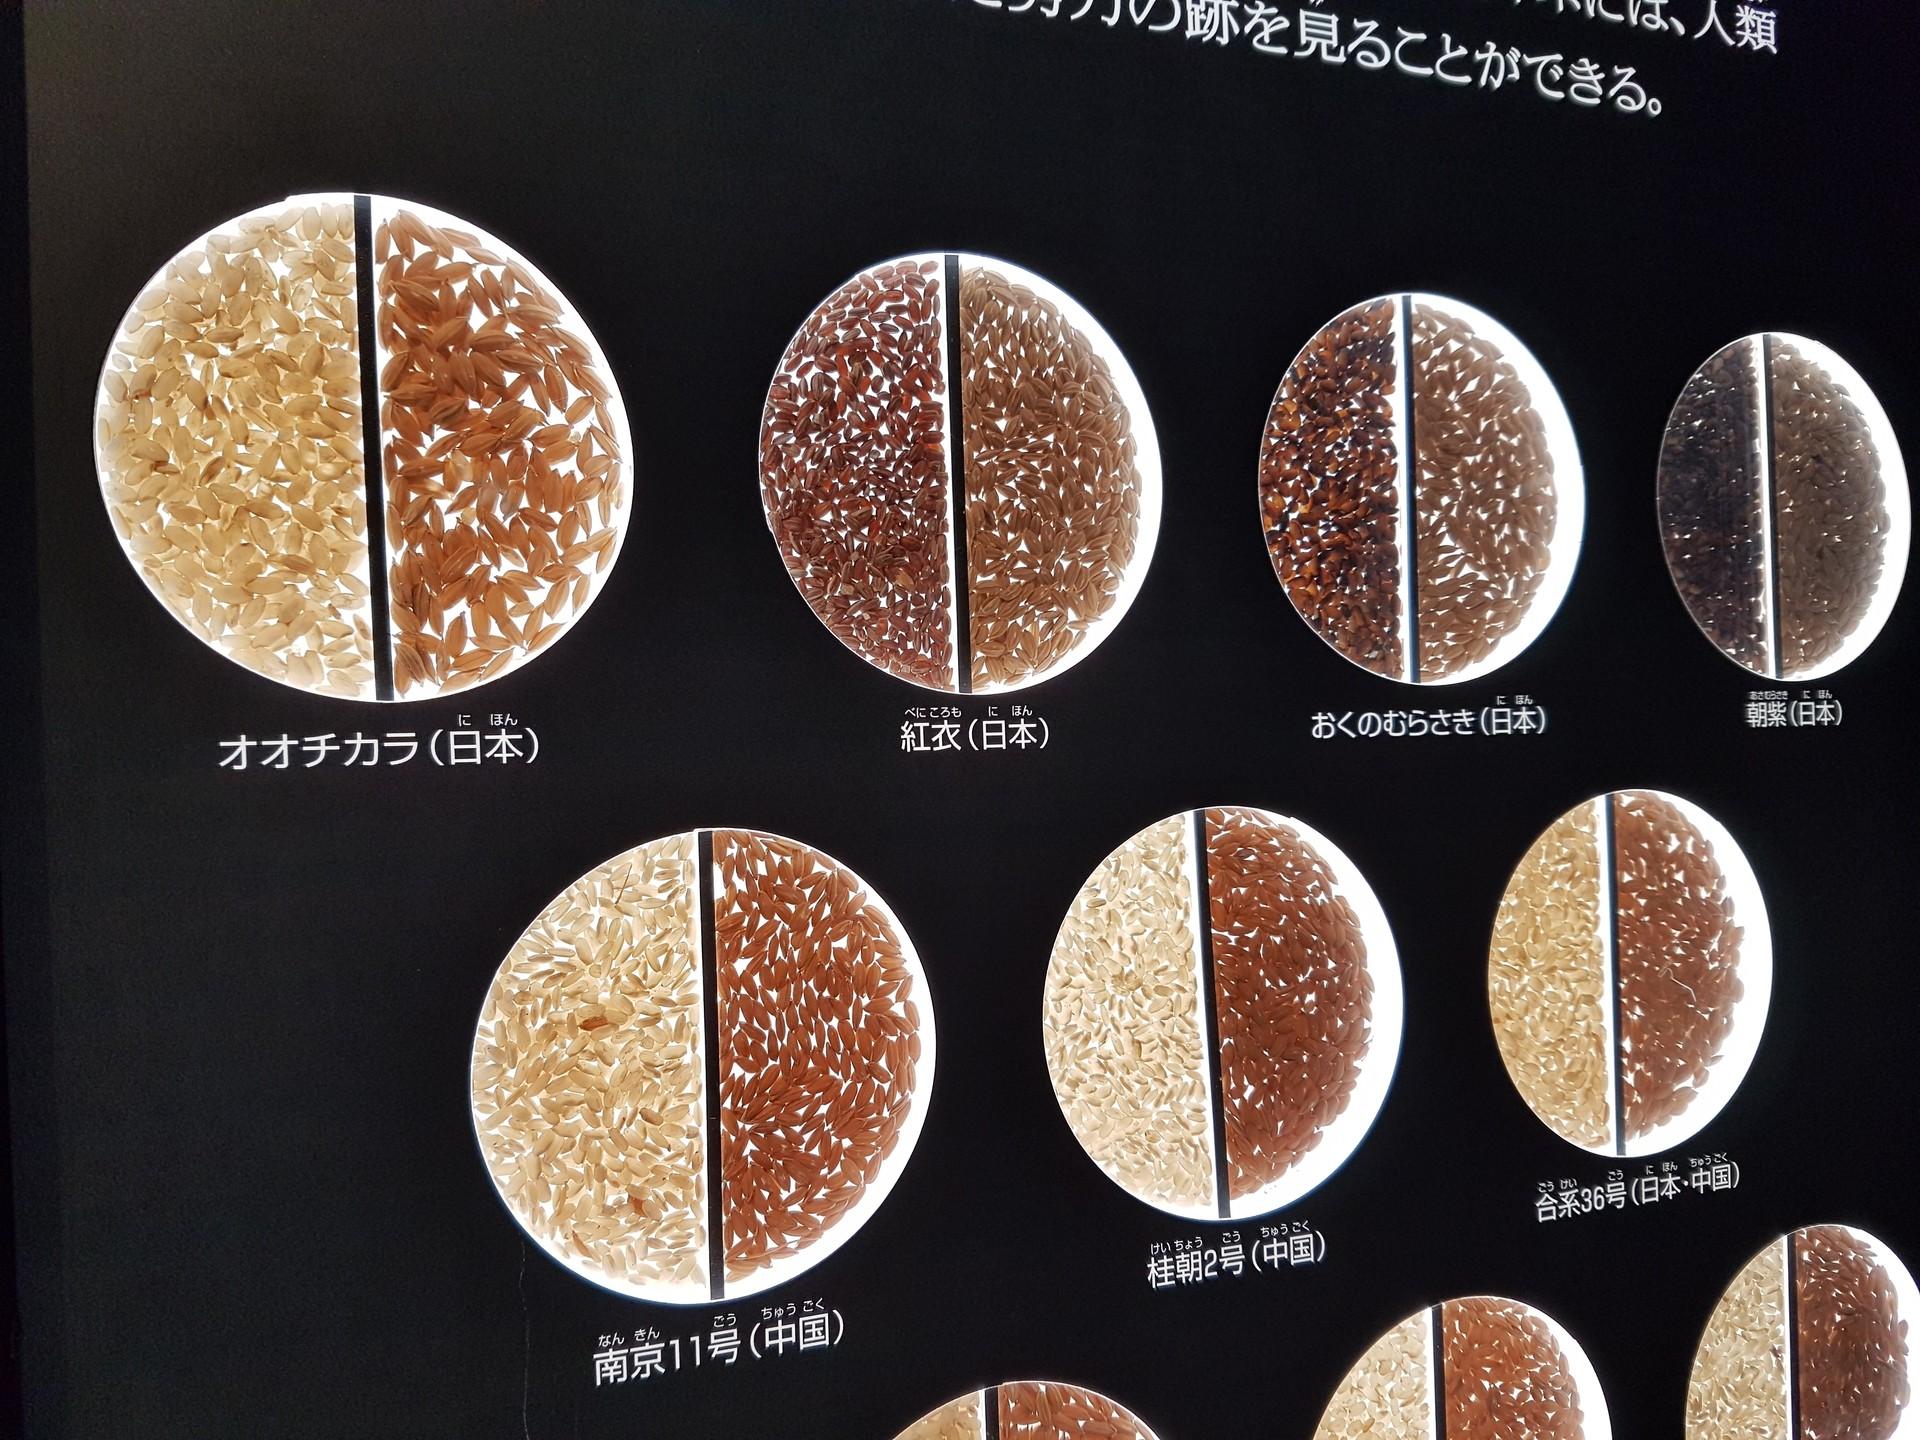 geeking-tokyo-national-museum-science-85